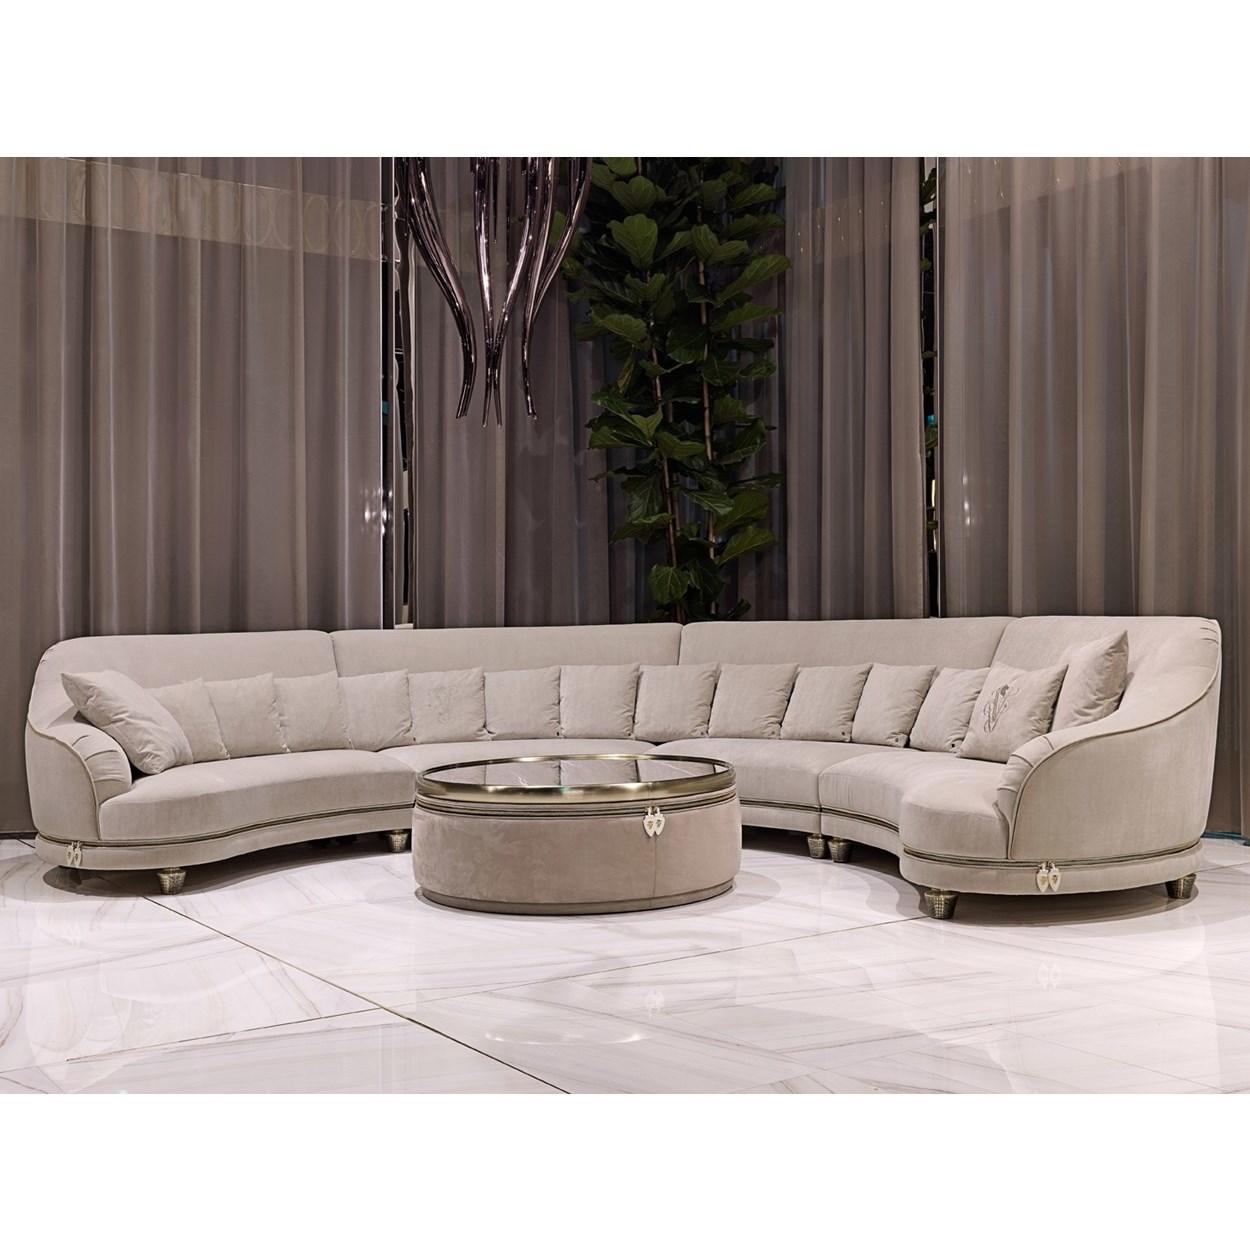 italian sofa messina italian modular curve sofa KEGPXBU